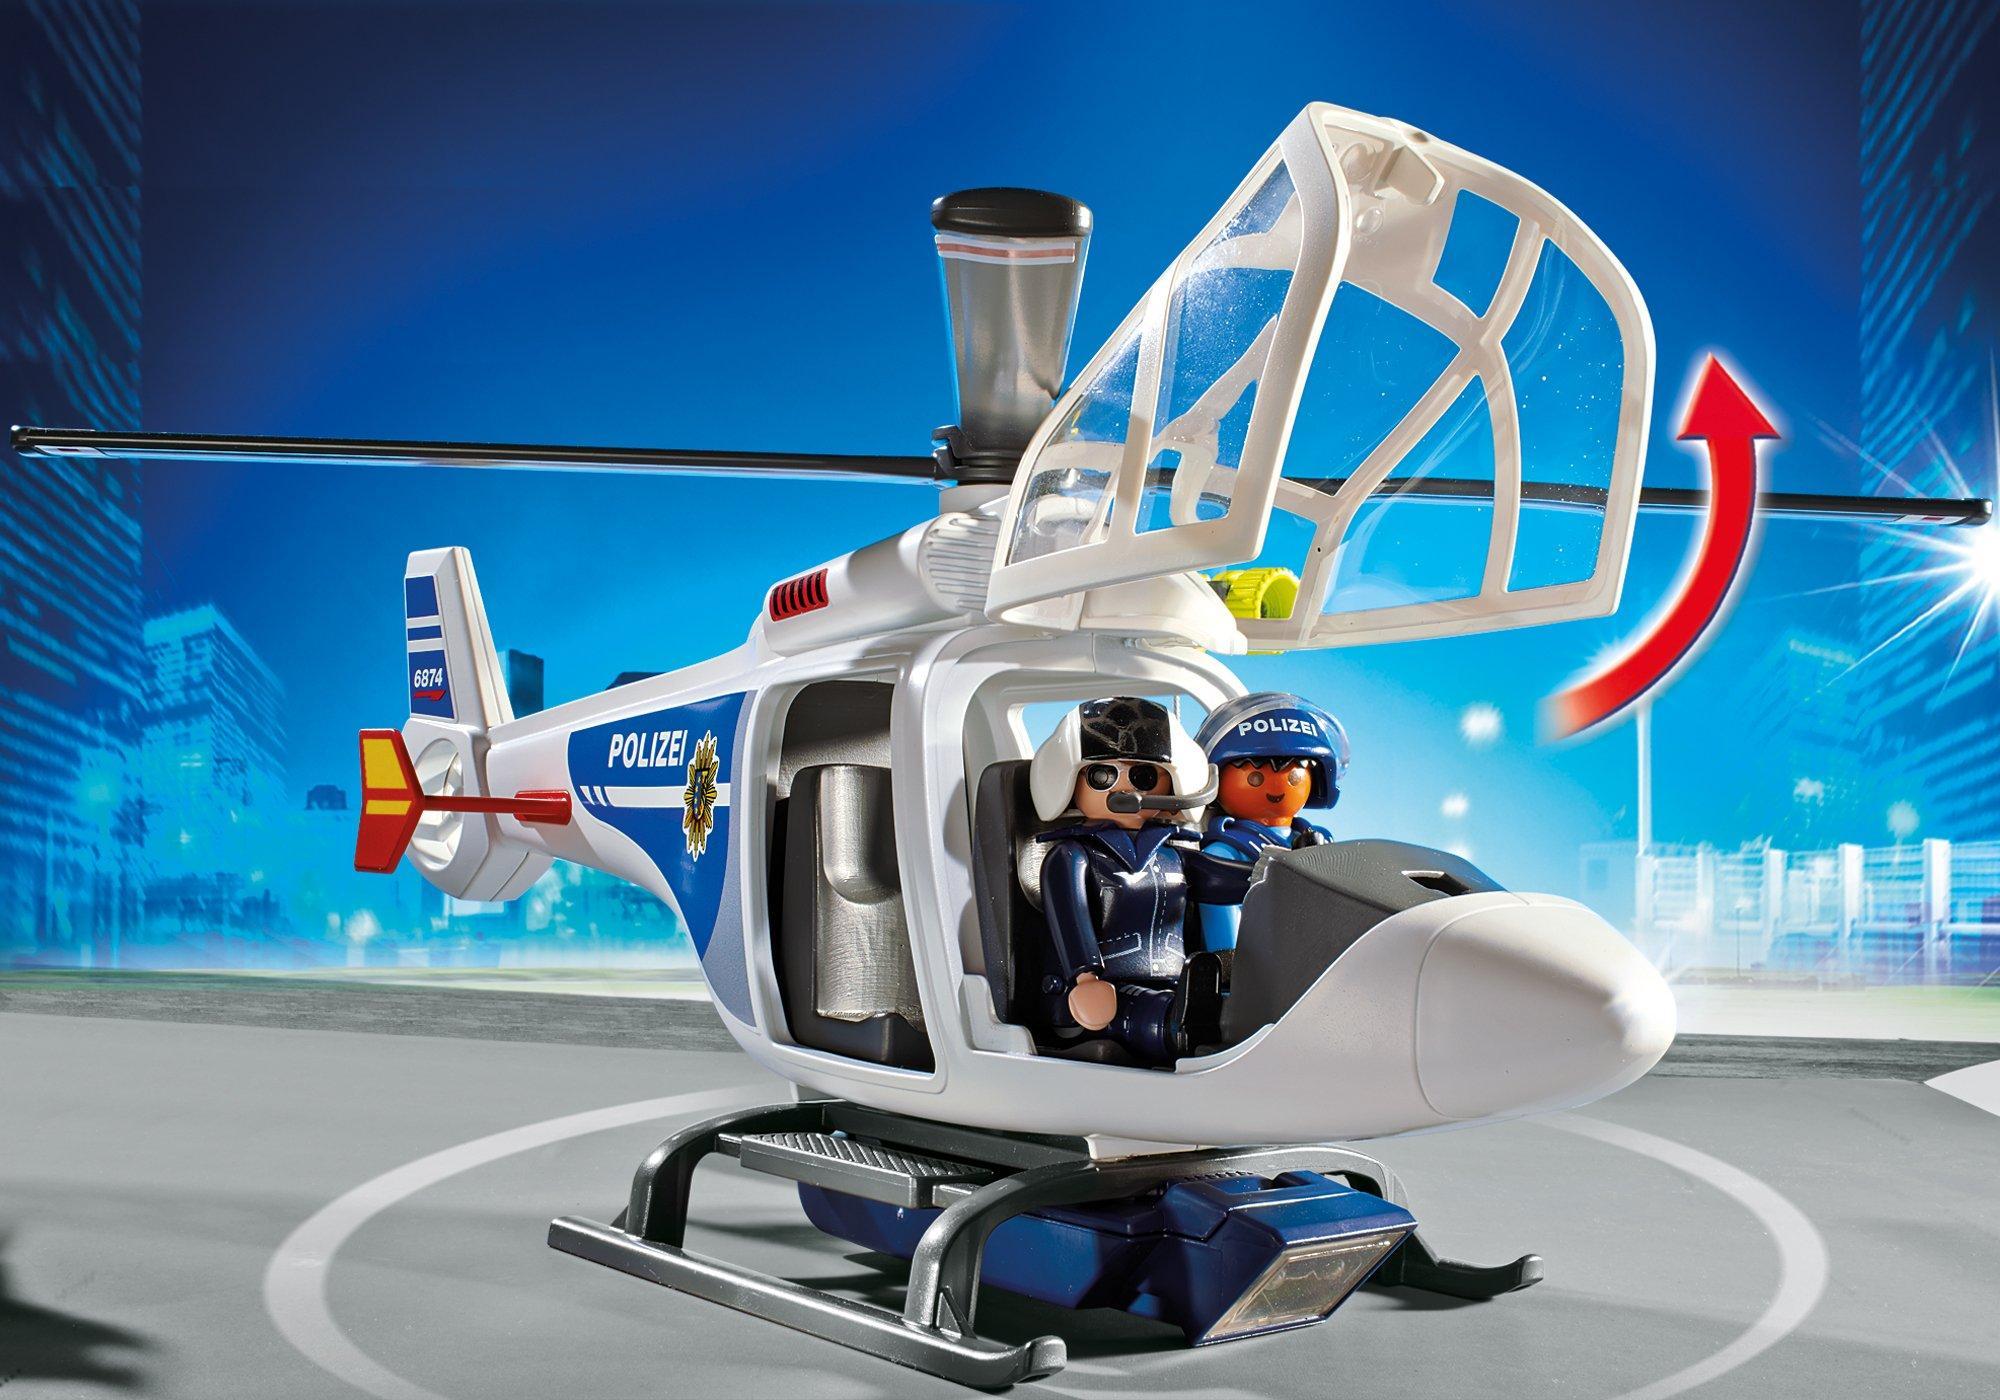 http://media.playmobil.com/i/playmobil/6874_product_extra1/Polizei-Helikopter mit LED-Suchscheinwerfer